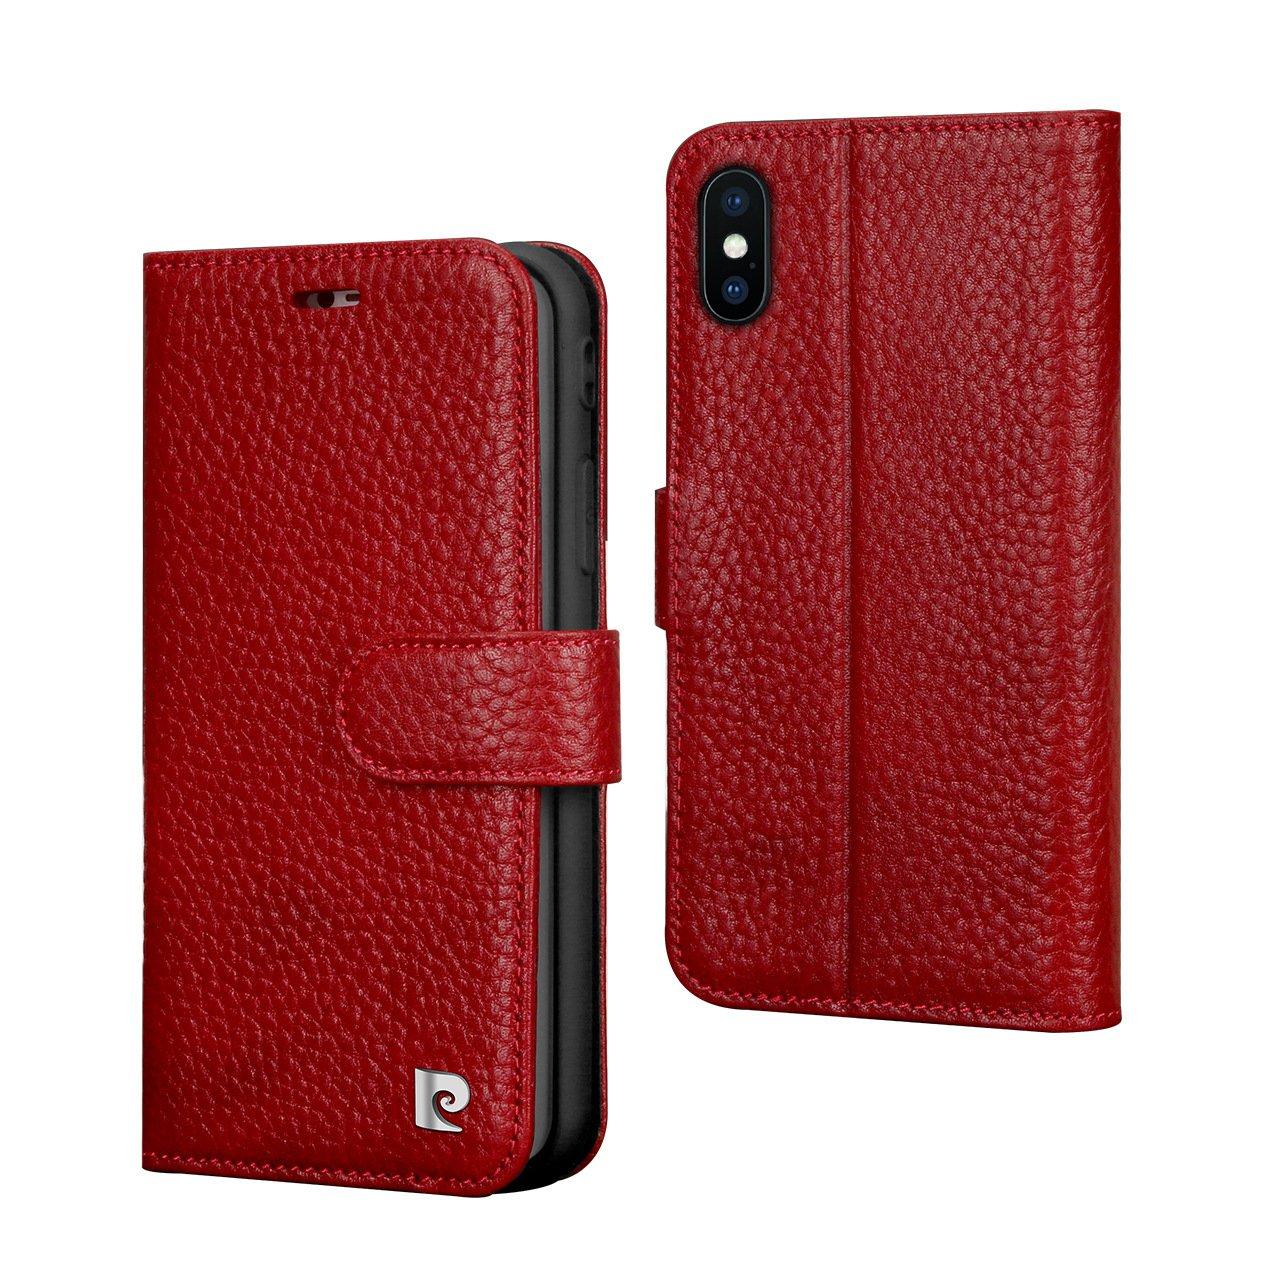 Pierre Cardin Wallet Case Premium Genuine Leather Folio Cover with Credit Card Flip Money Cash Kickstand Detachable Design Slots for Apple iPhone X (Red)